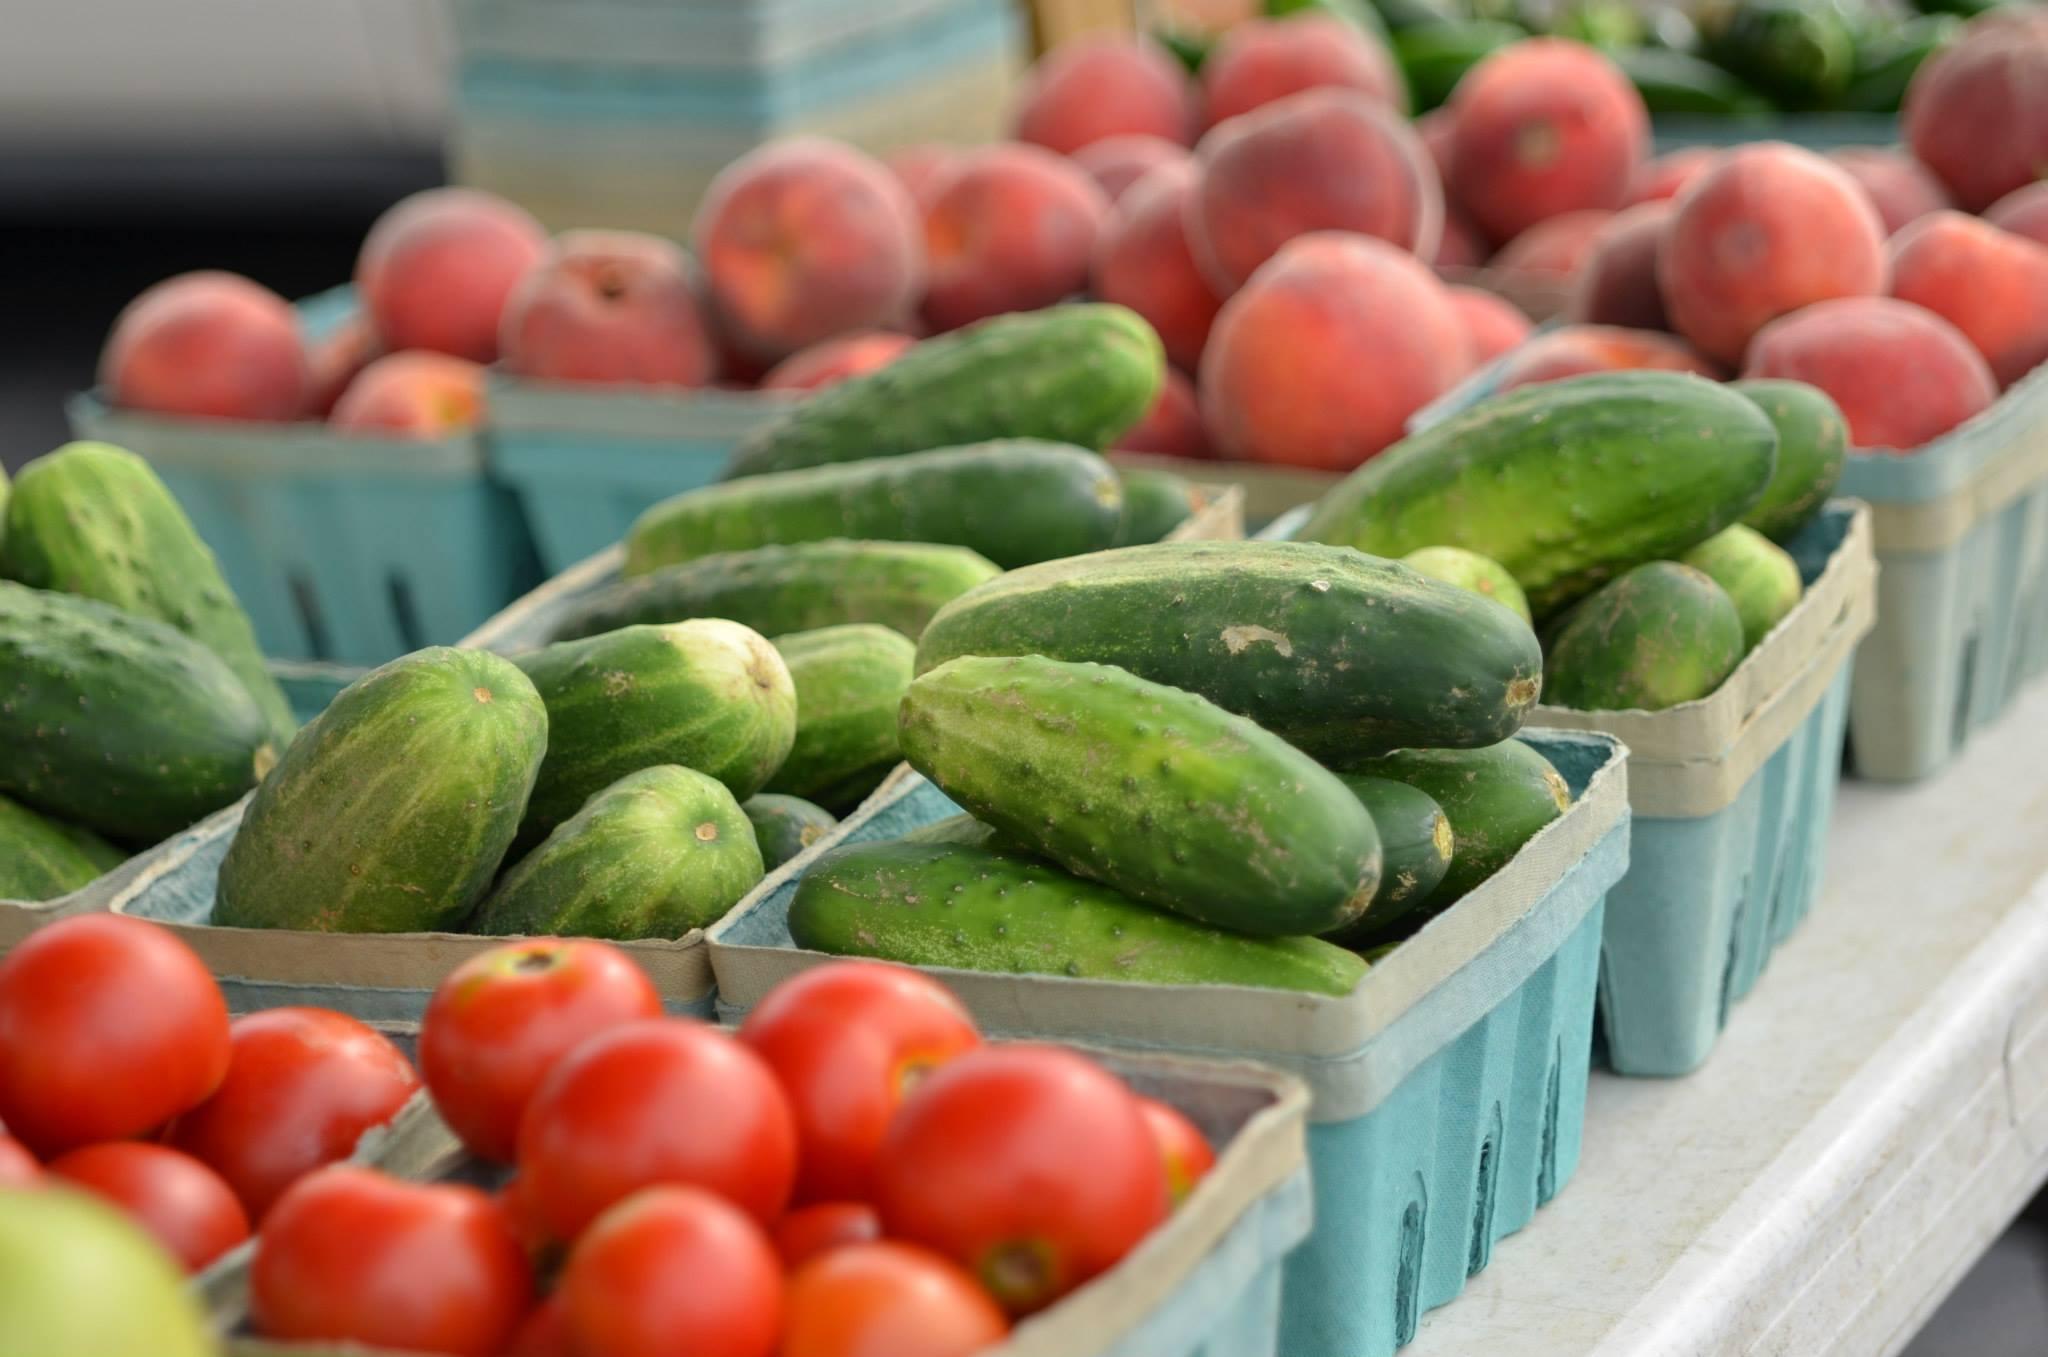 Rainsville's Farmer's Market Now Open